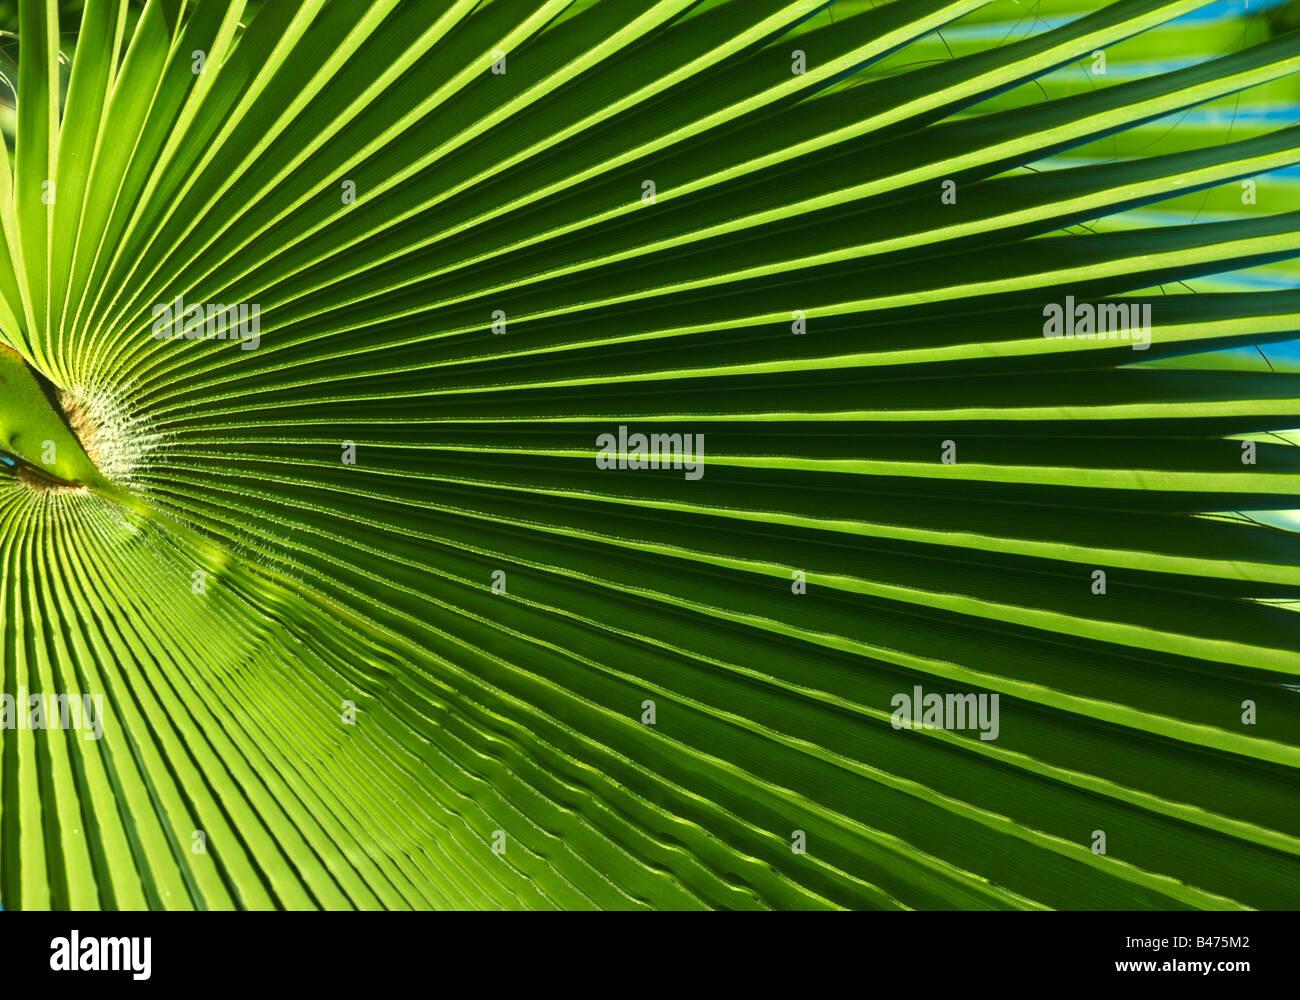 Palm leaf, Canary Islands - Stock Image